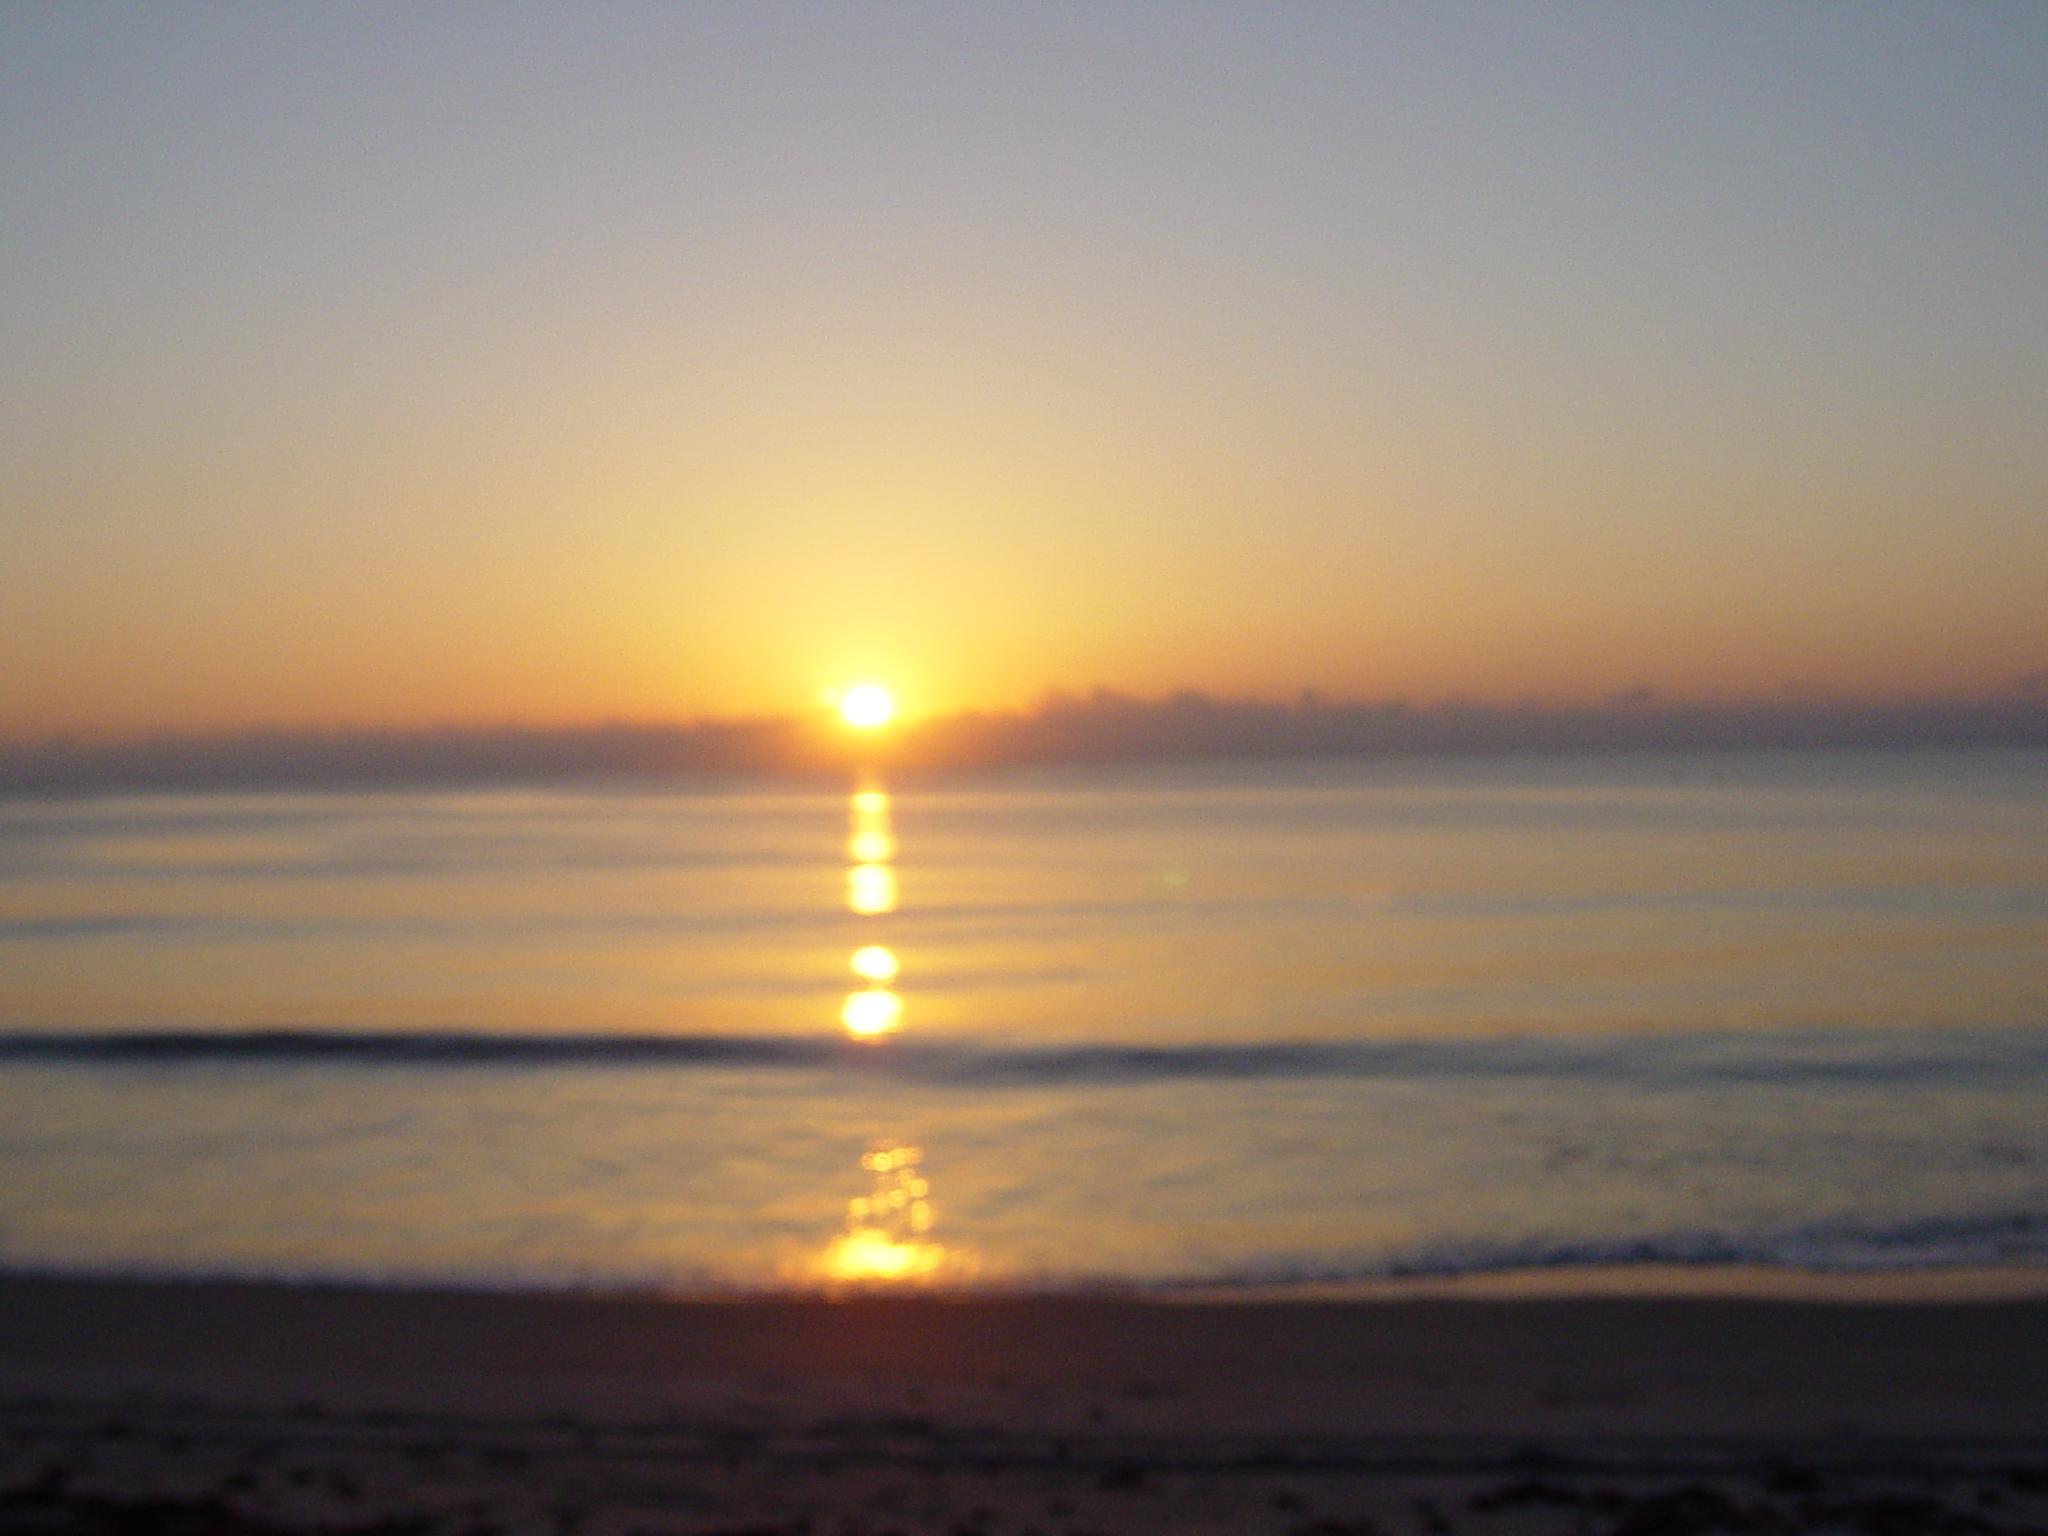 Sunrise on beach at Endeavor shuttle launch 5/15/11